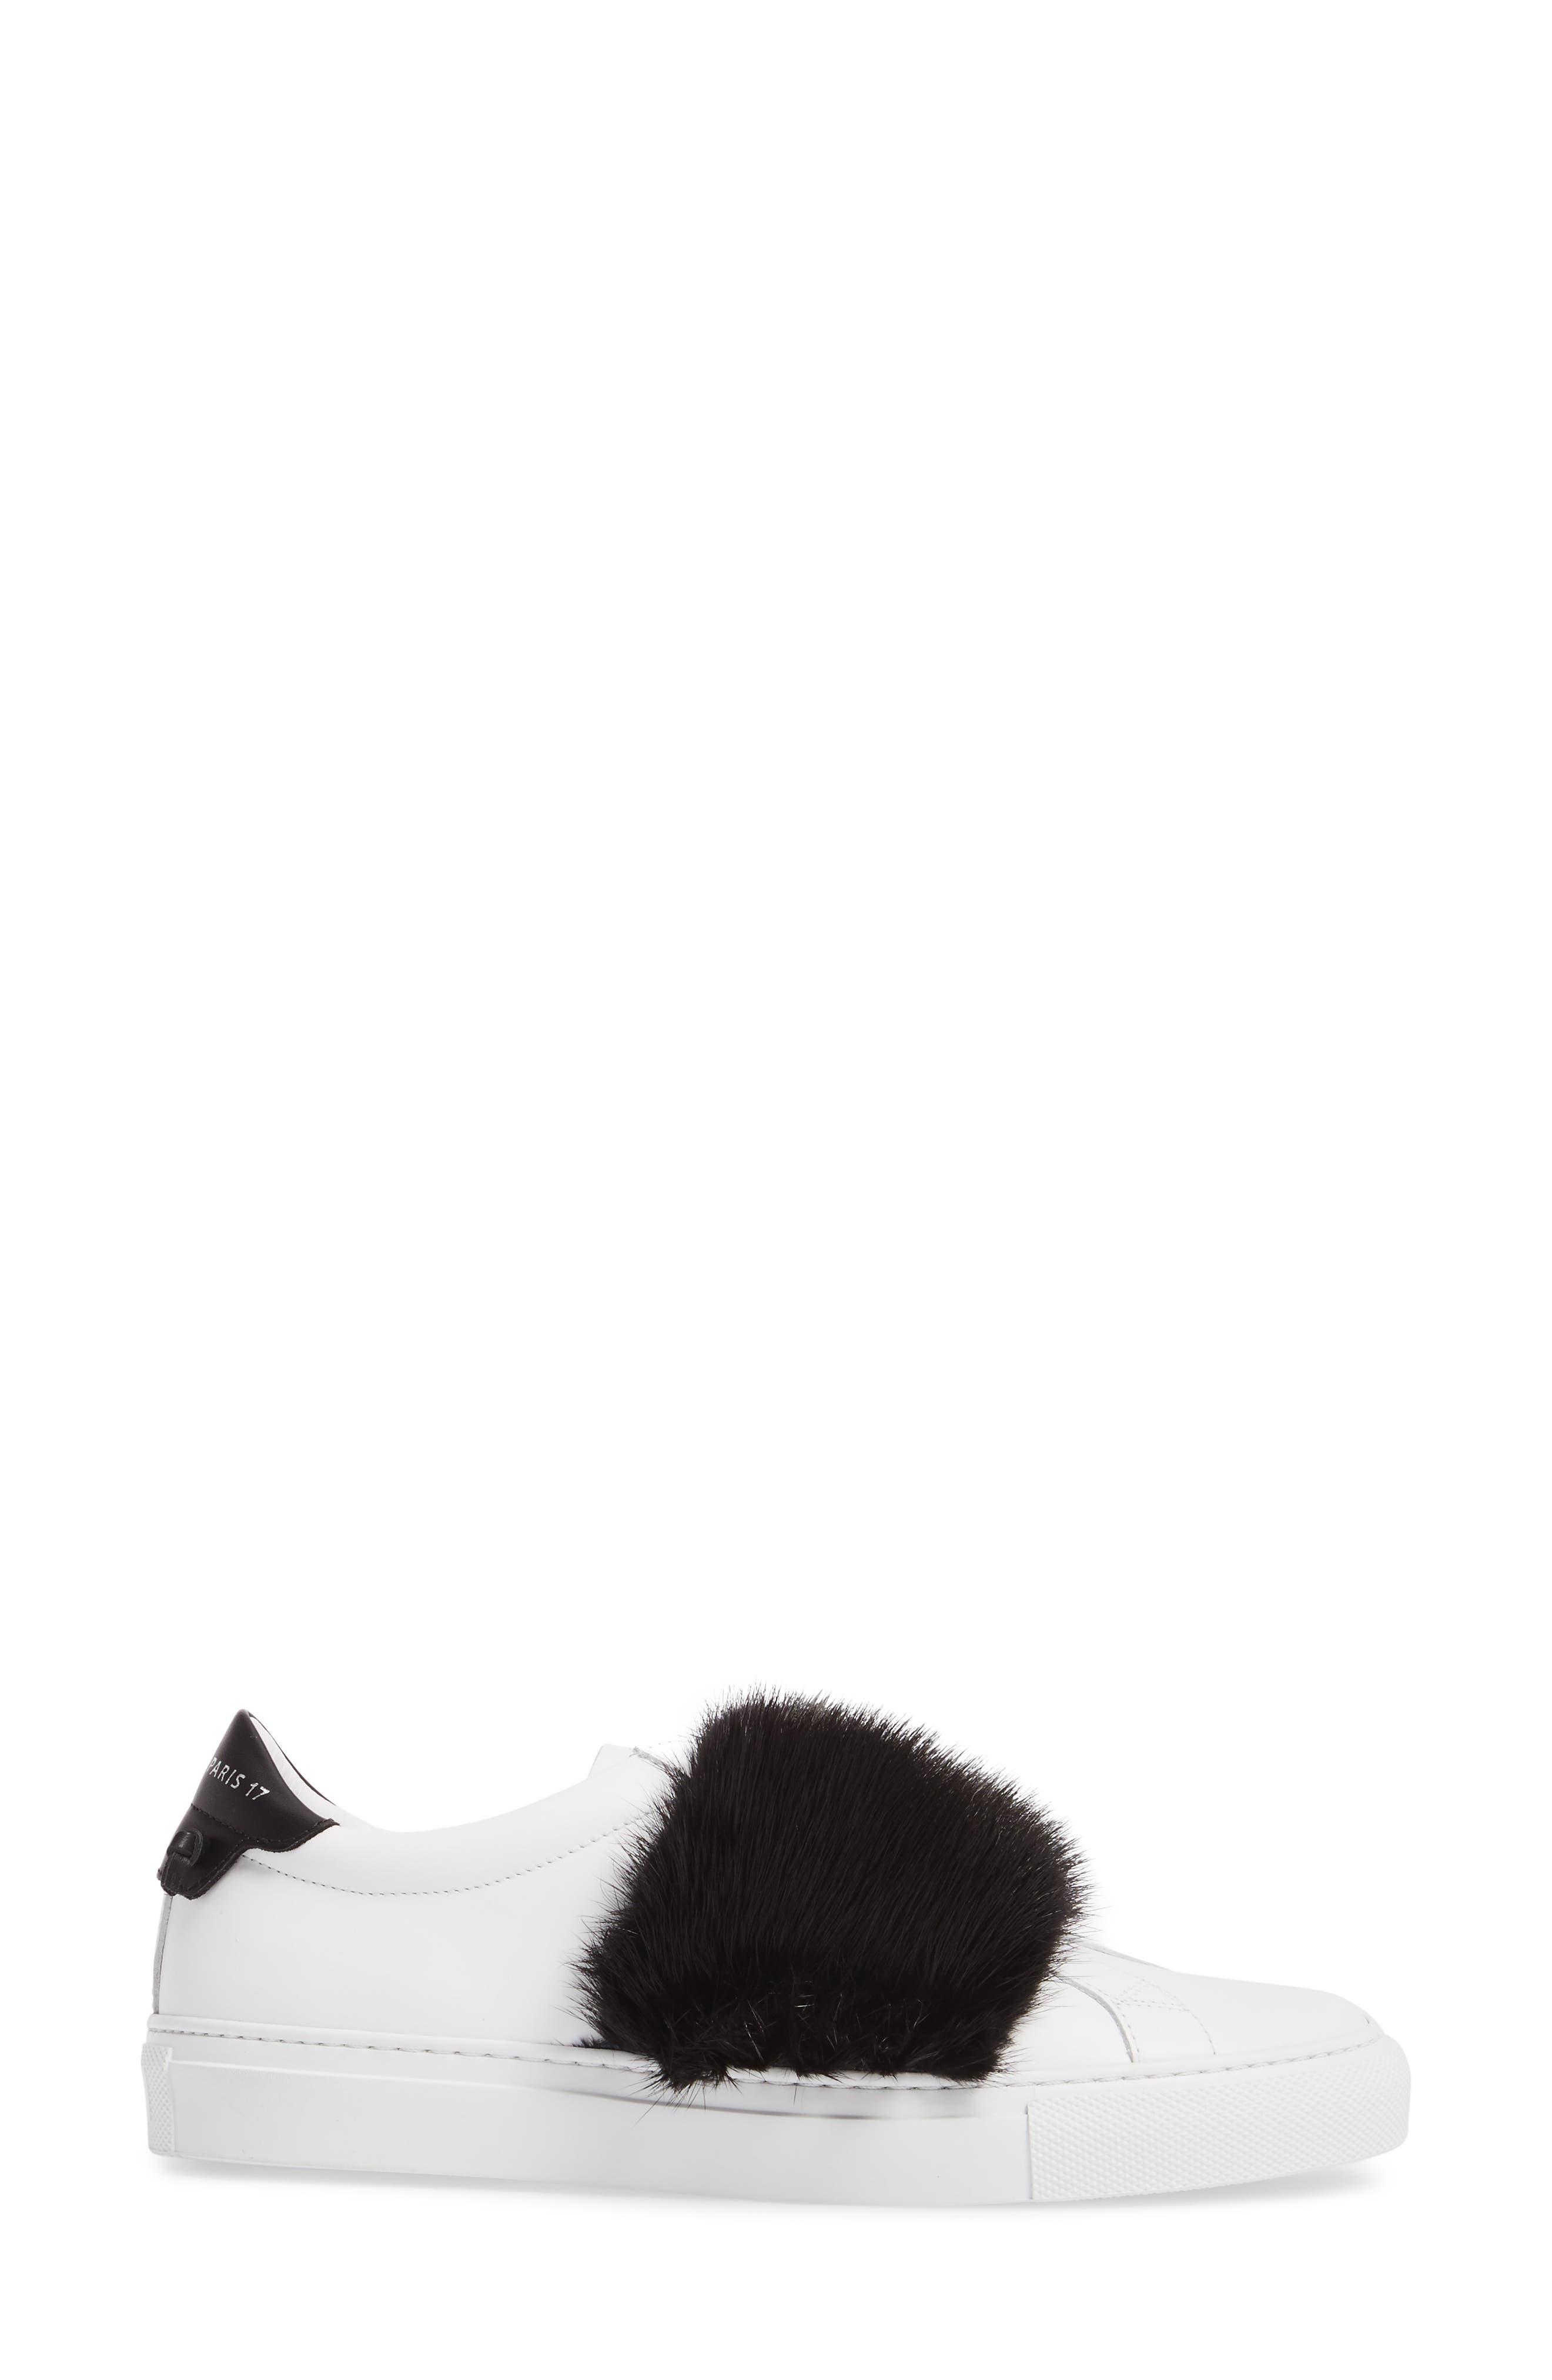 Urban Street Slip-On Sneaker with Genuine Mink Fur Trim,                             Alternate thumbnail 3, color,                             115